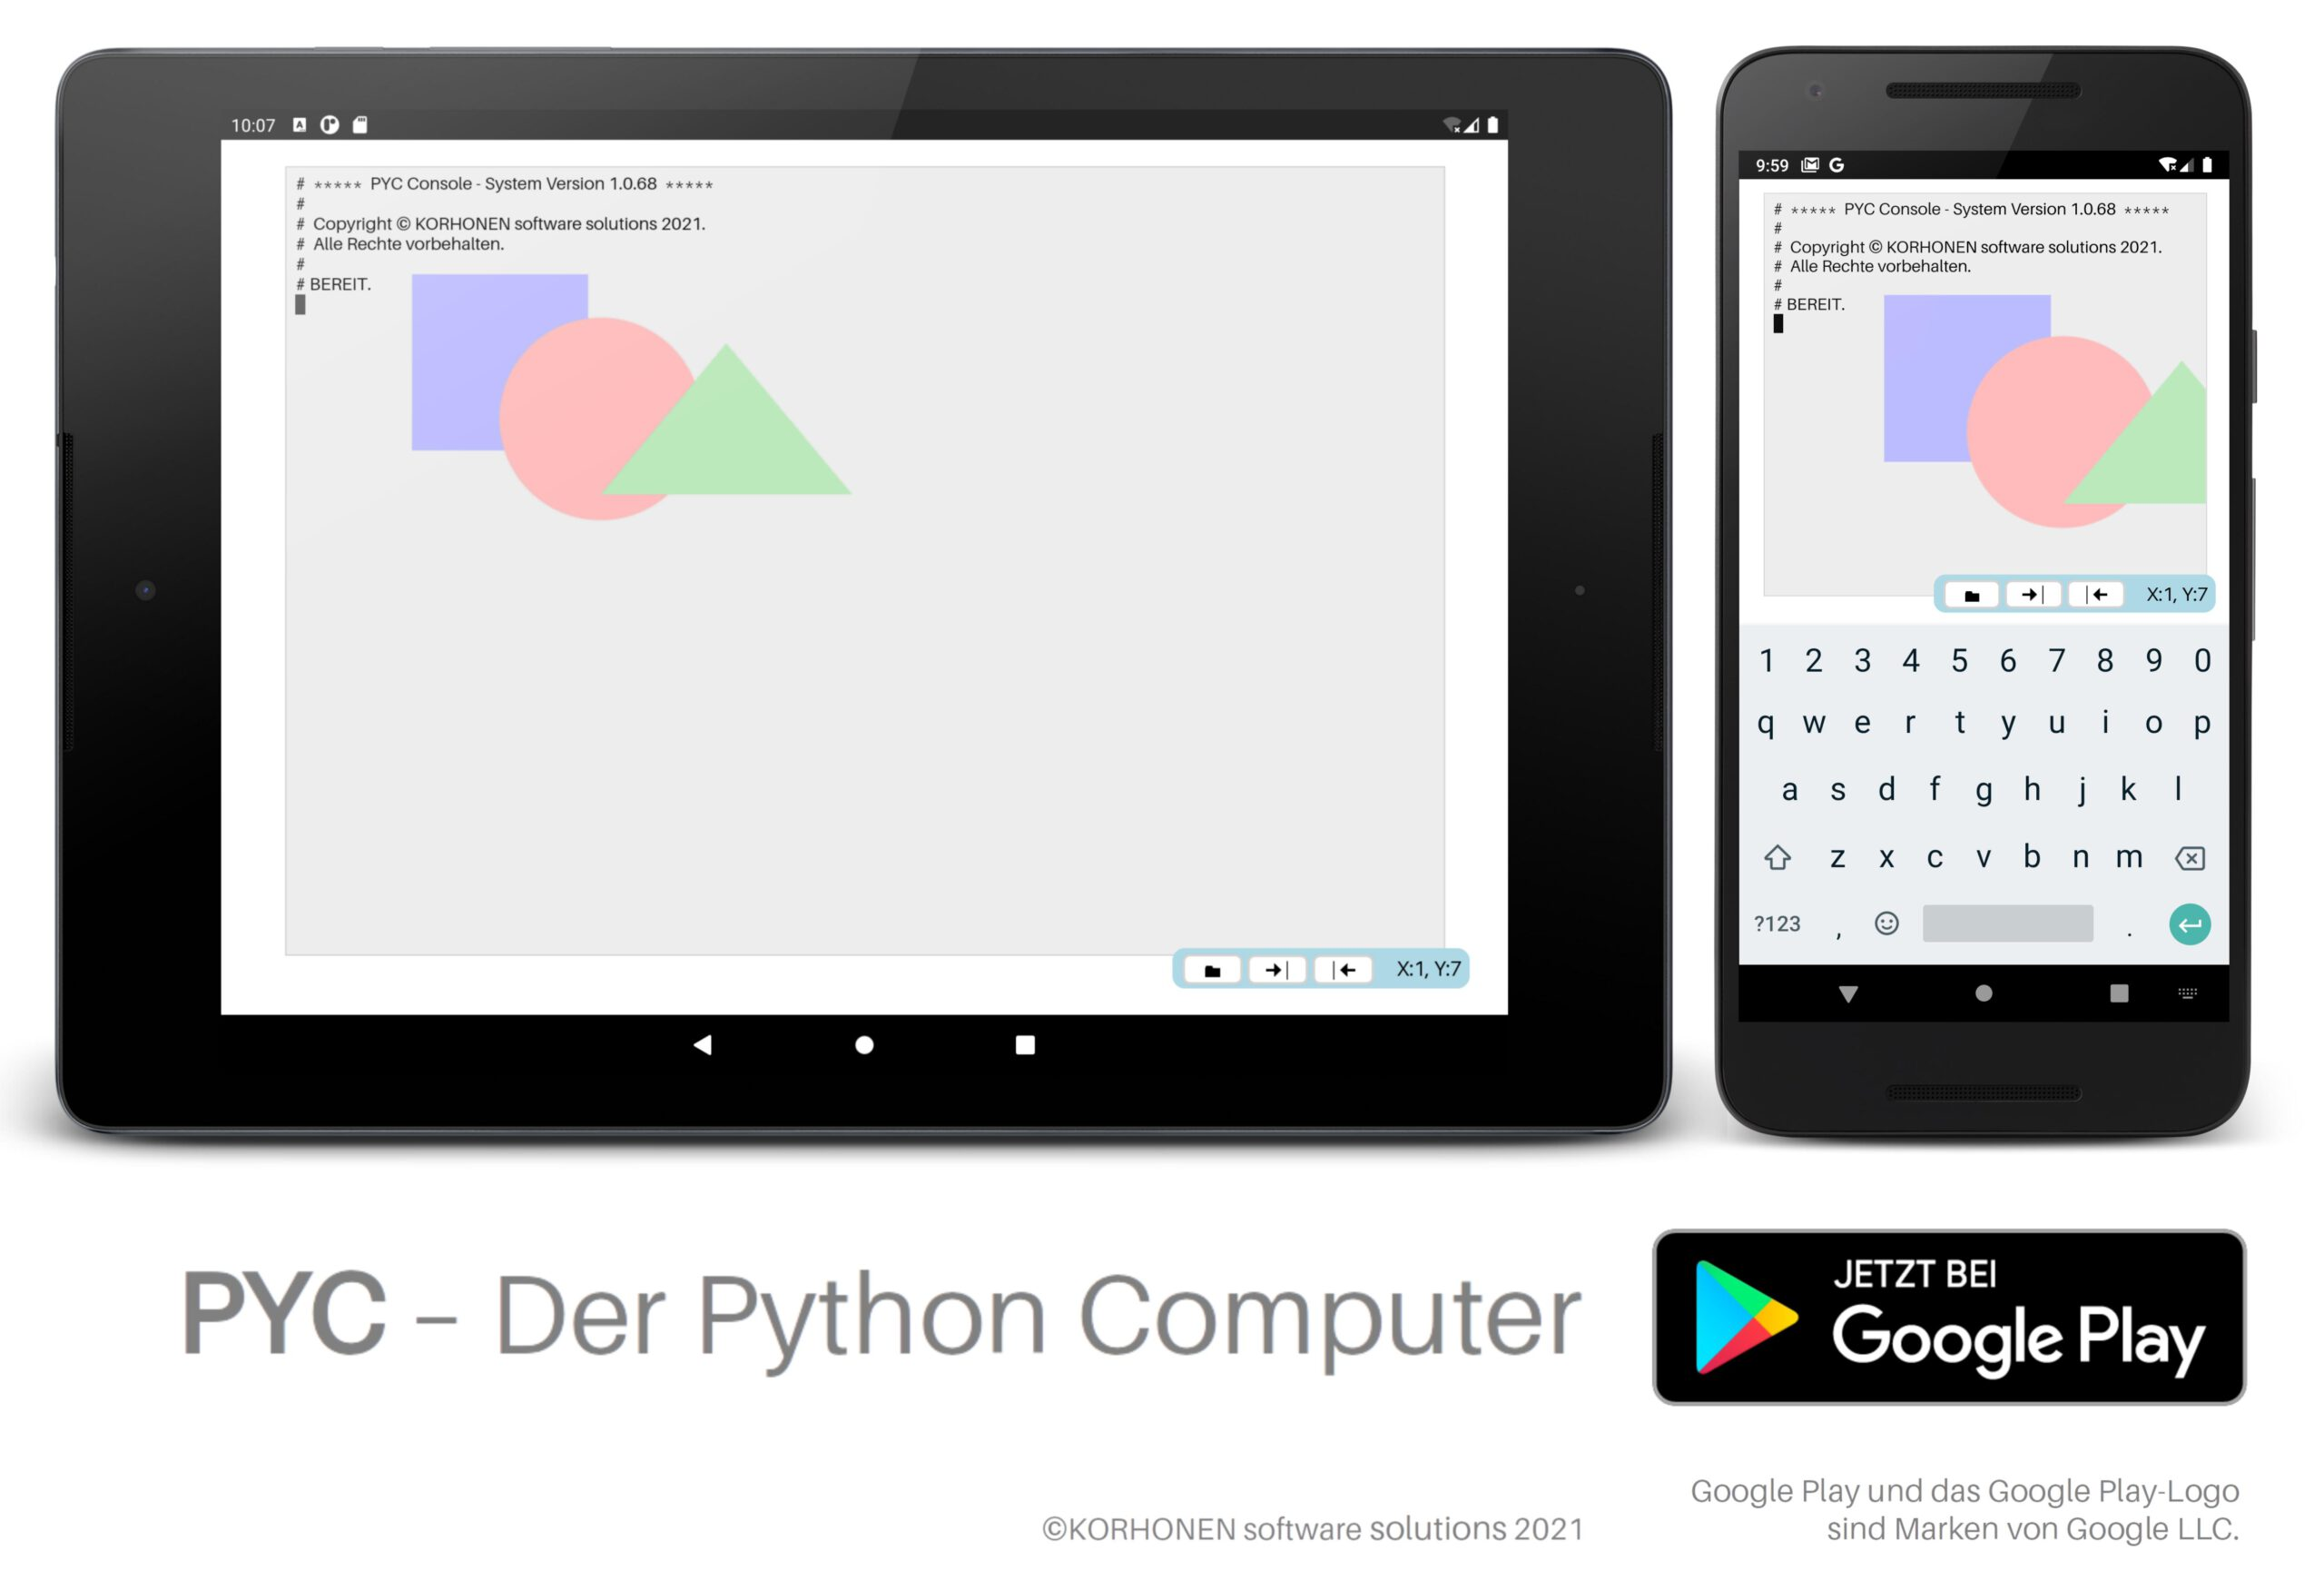 PYC The Python Computer